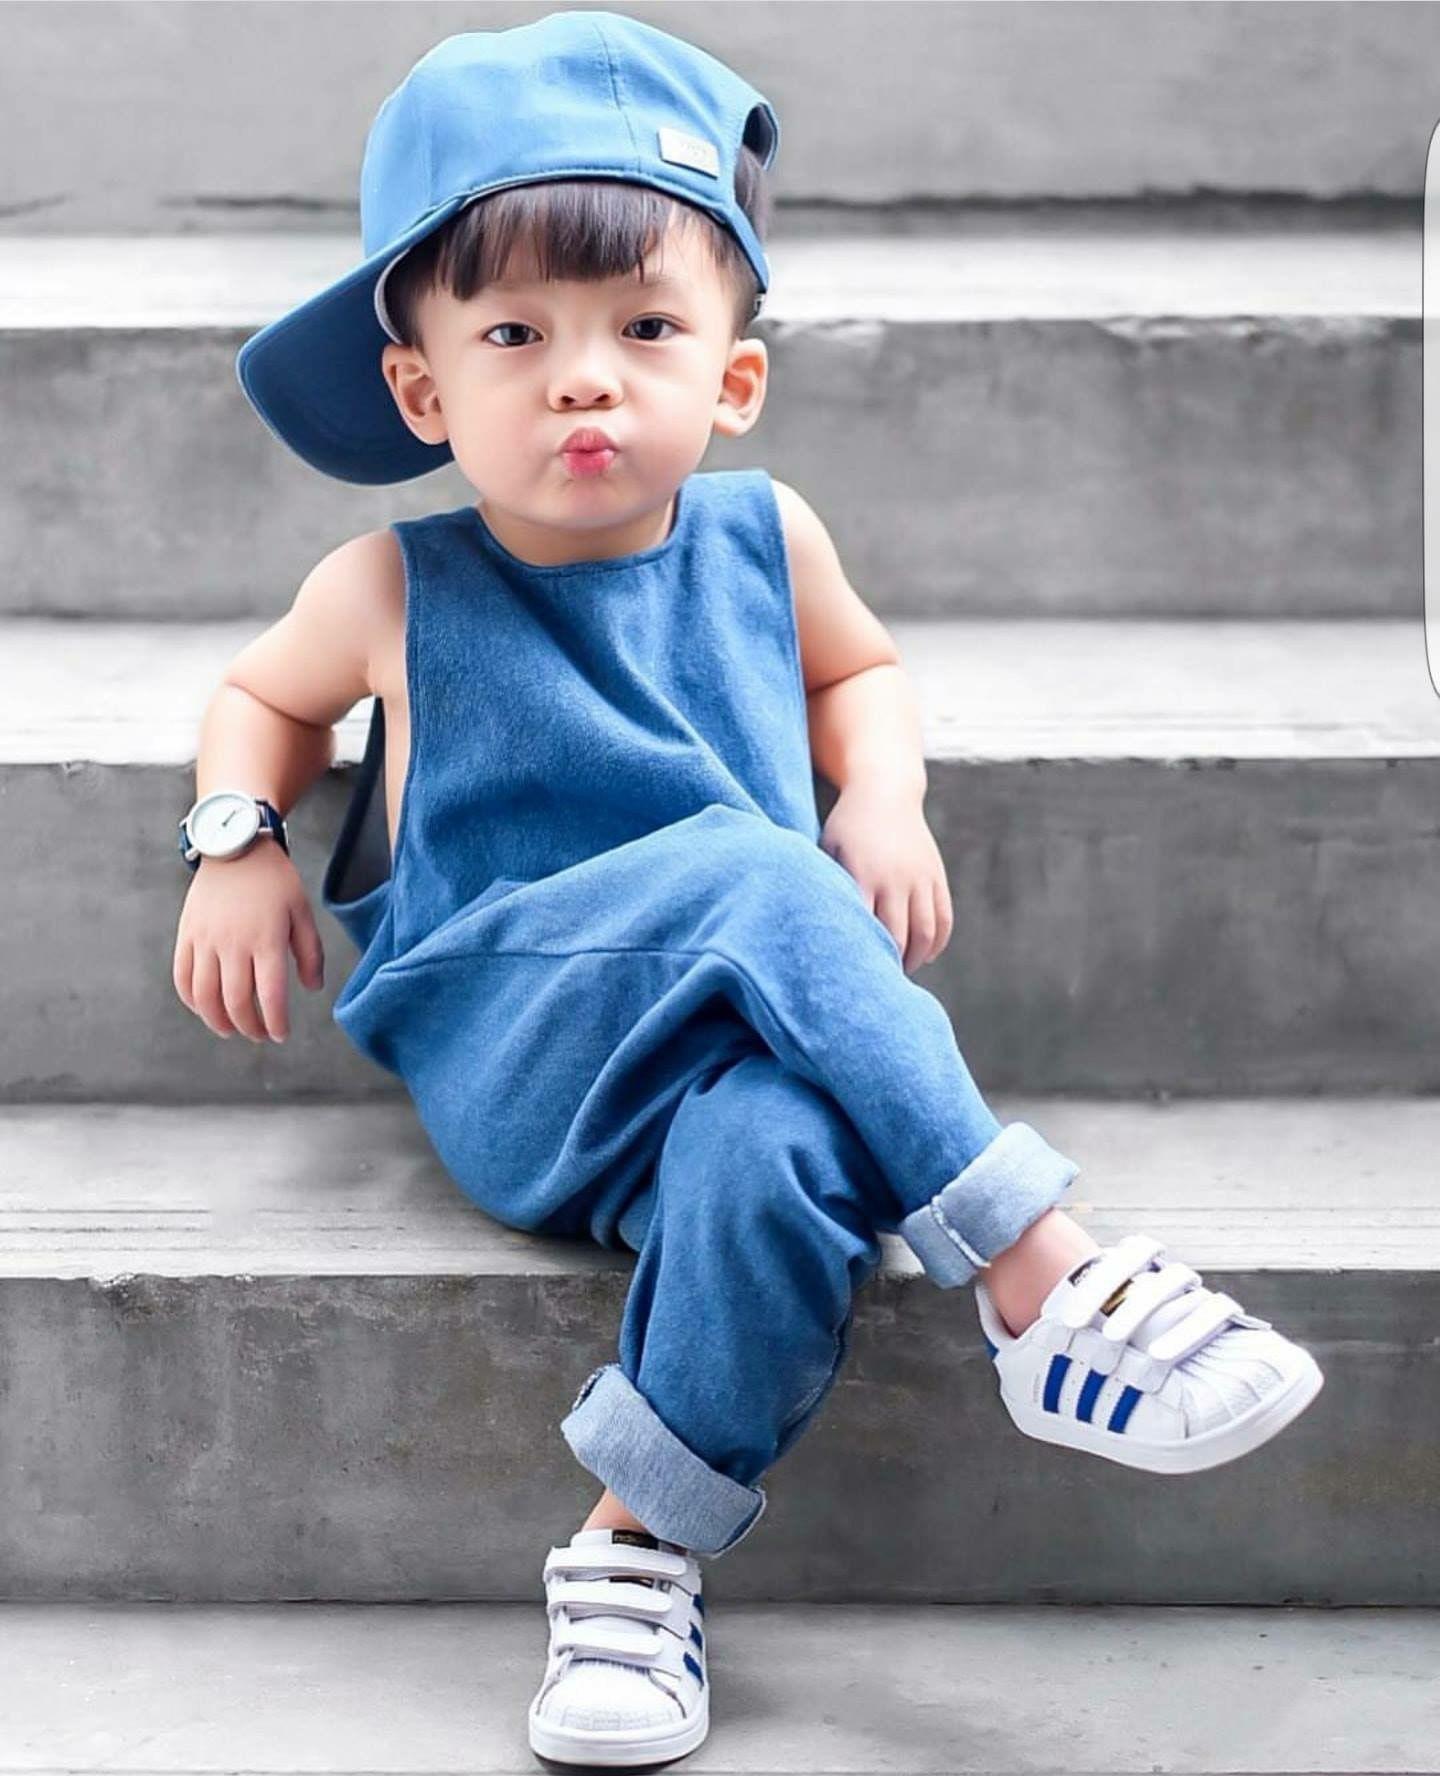 Imran Shehzaad Stylish Boy Clothes Kids Dress Boys Cute Kids Fashion